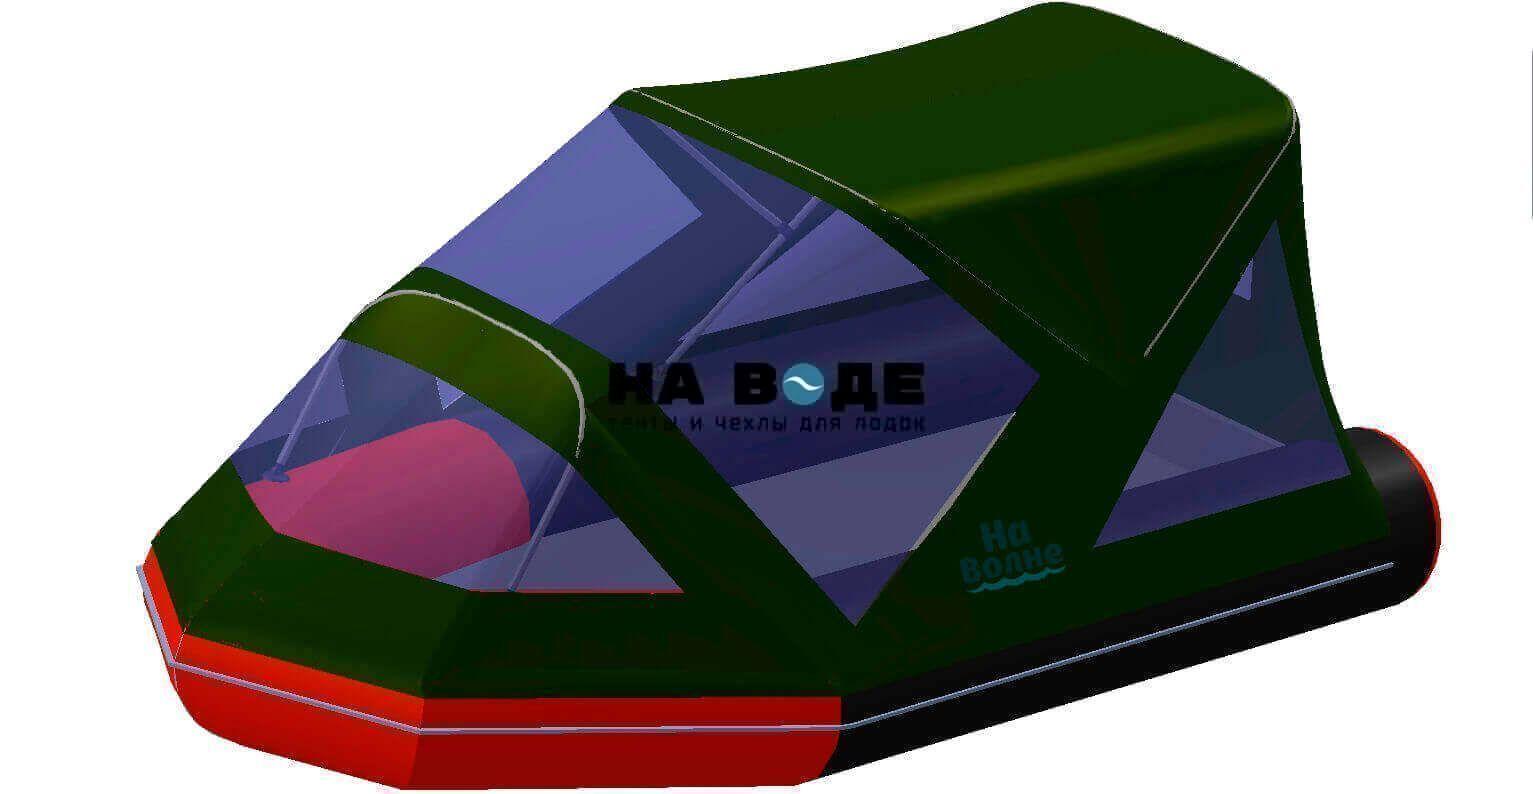 Тент комбинированный на лодку Лоцман М340 (Киль), комплектация Классик - фото 8